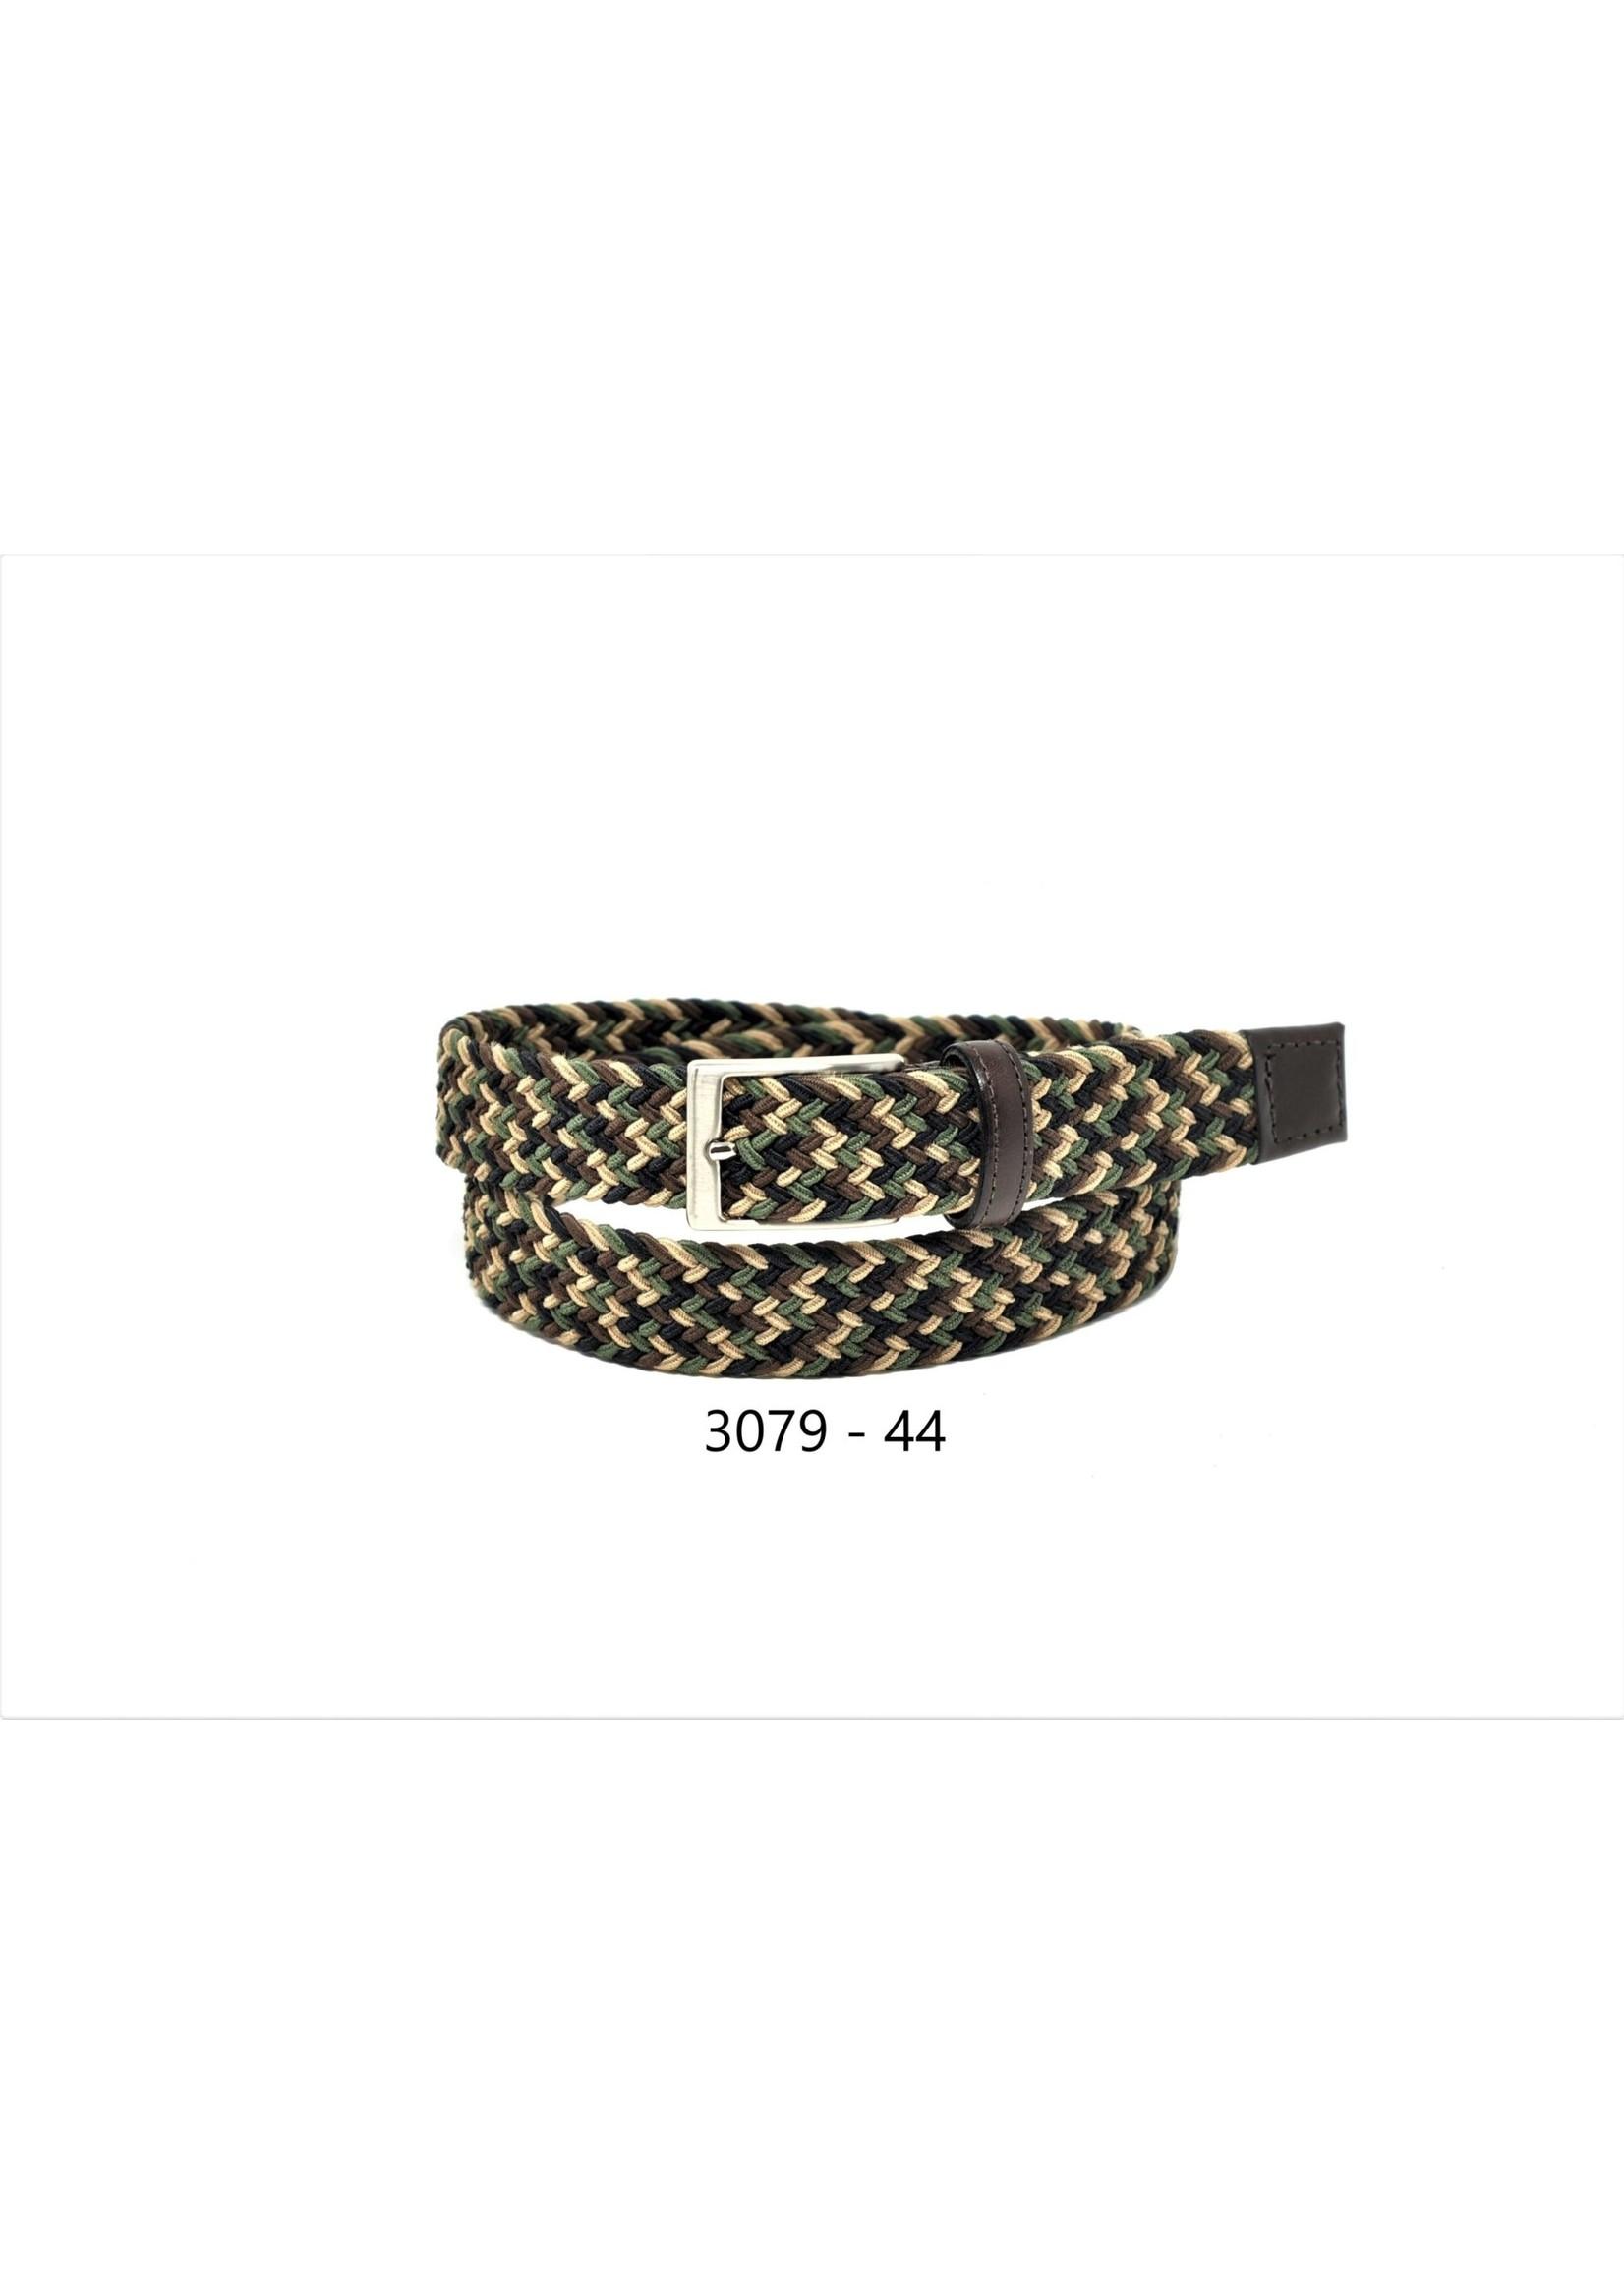 Bench Craft Leather Bench Craft's Braided Stretch Belt (3079)